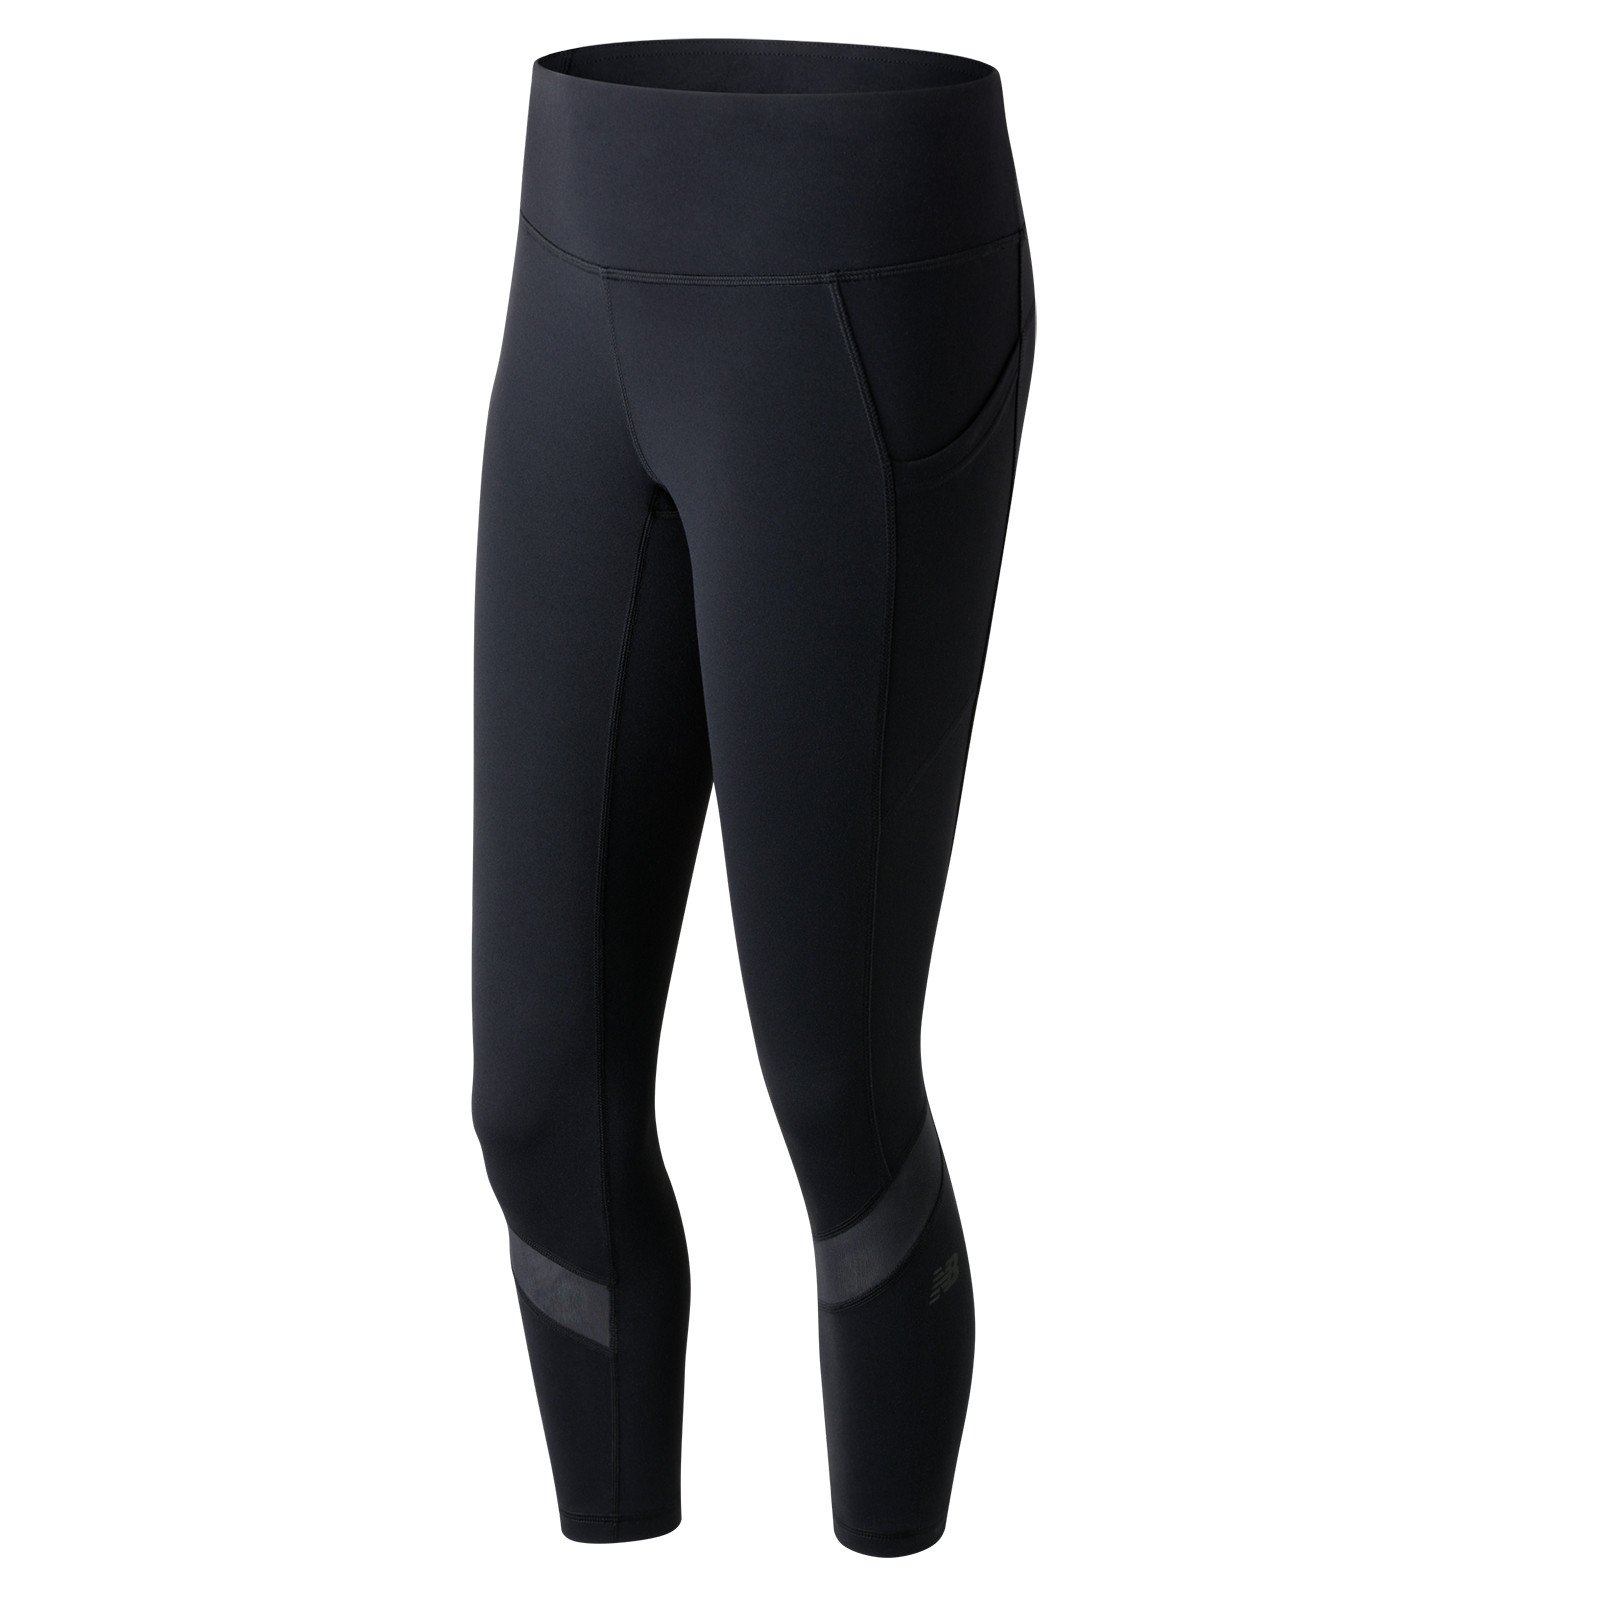 New Balance Women's Premium Performance Fashion Crop Pants, Black, Large by New Balance (Image #1)